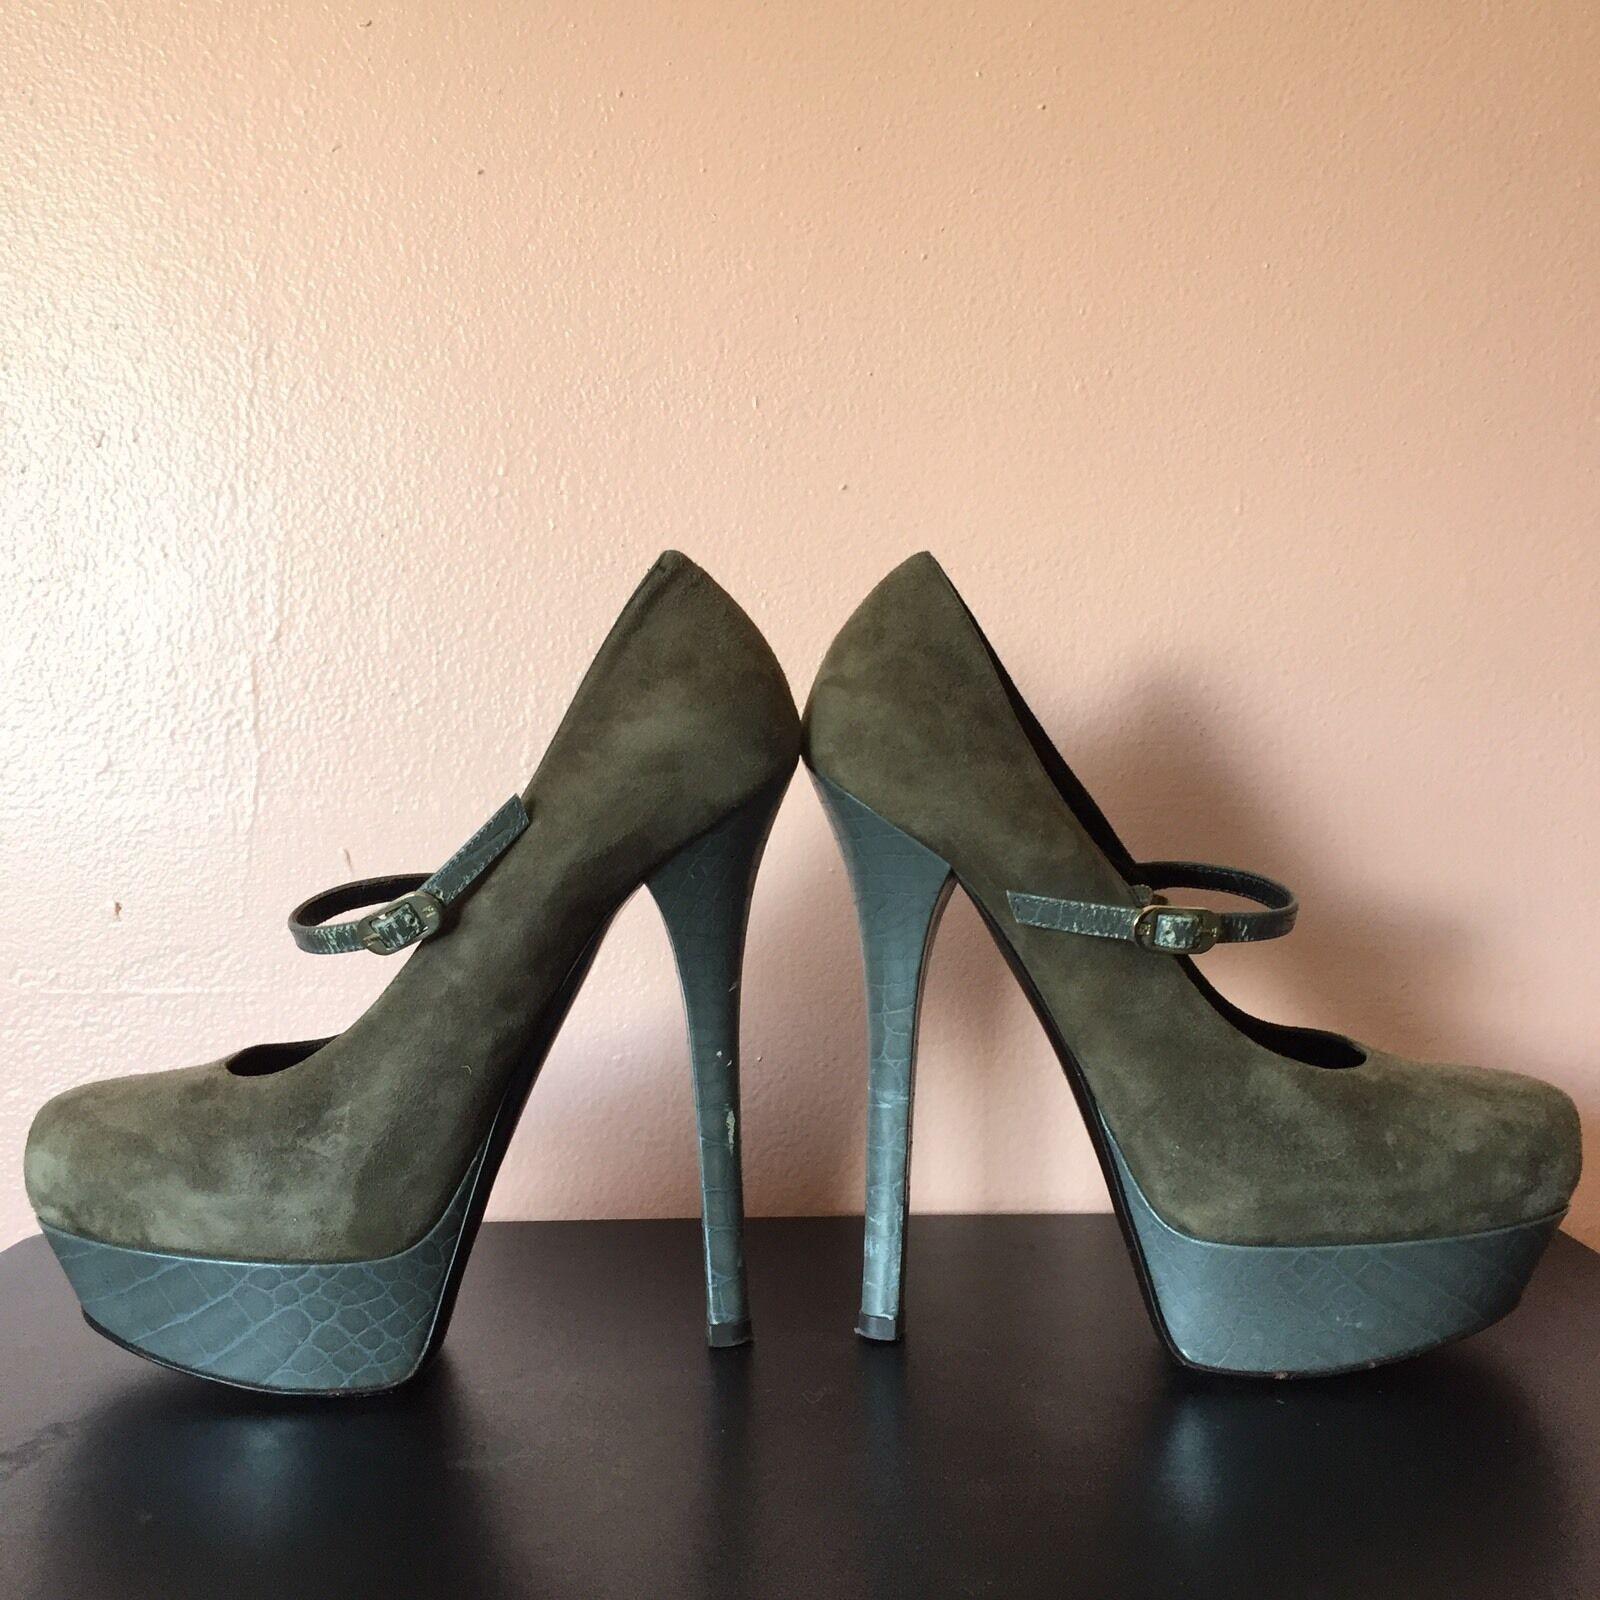 consegna lampo Fendi Mary Jane Jane Jane Platform Heels MSRP  875  qualità autentica